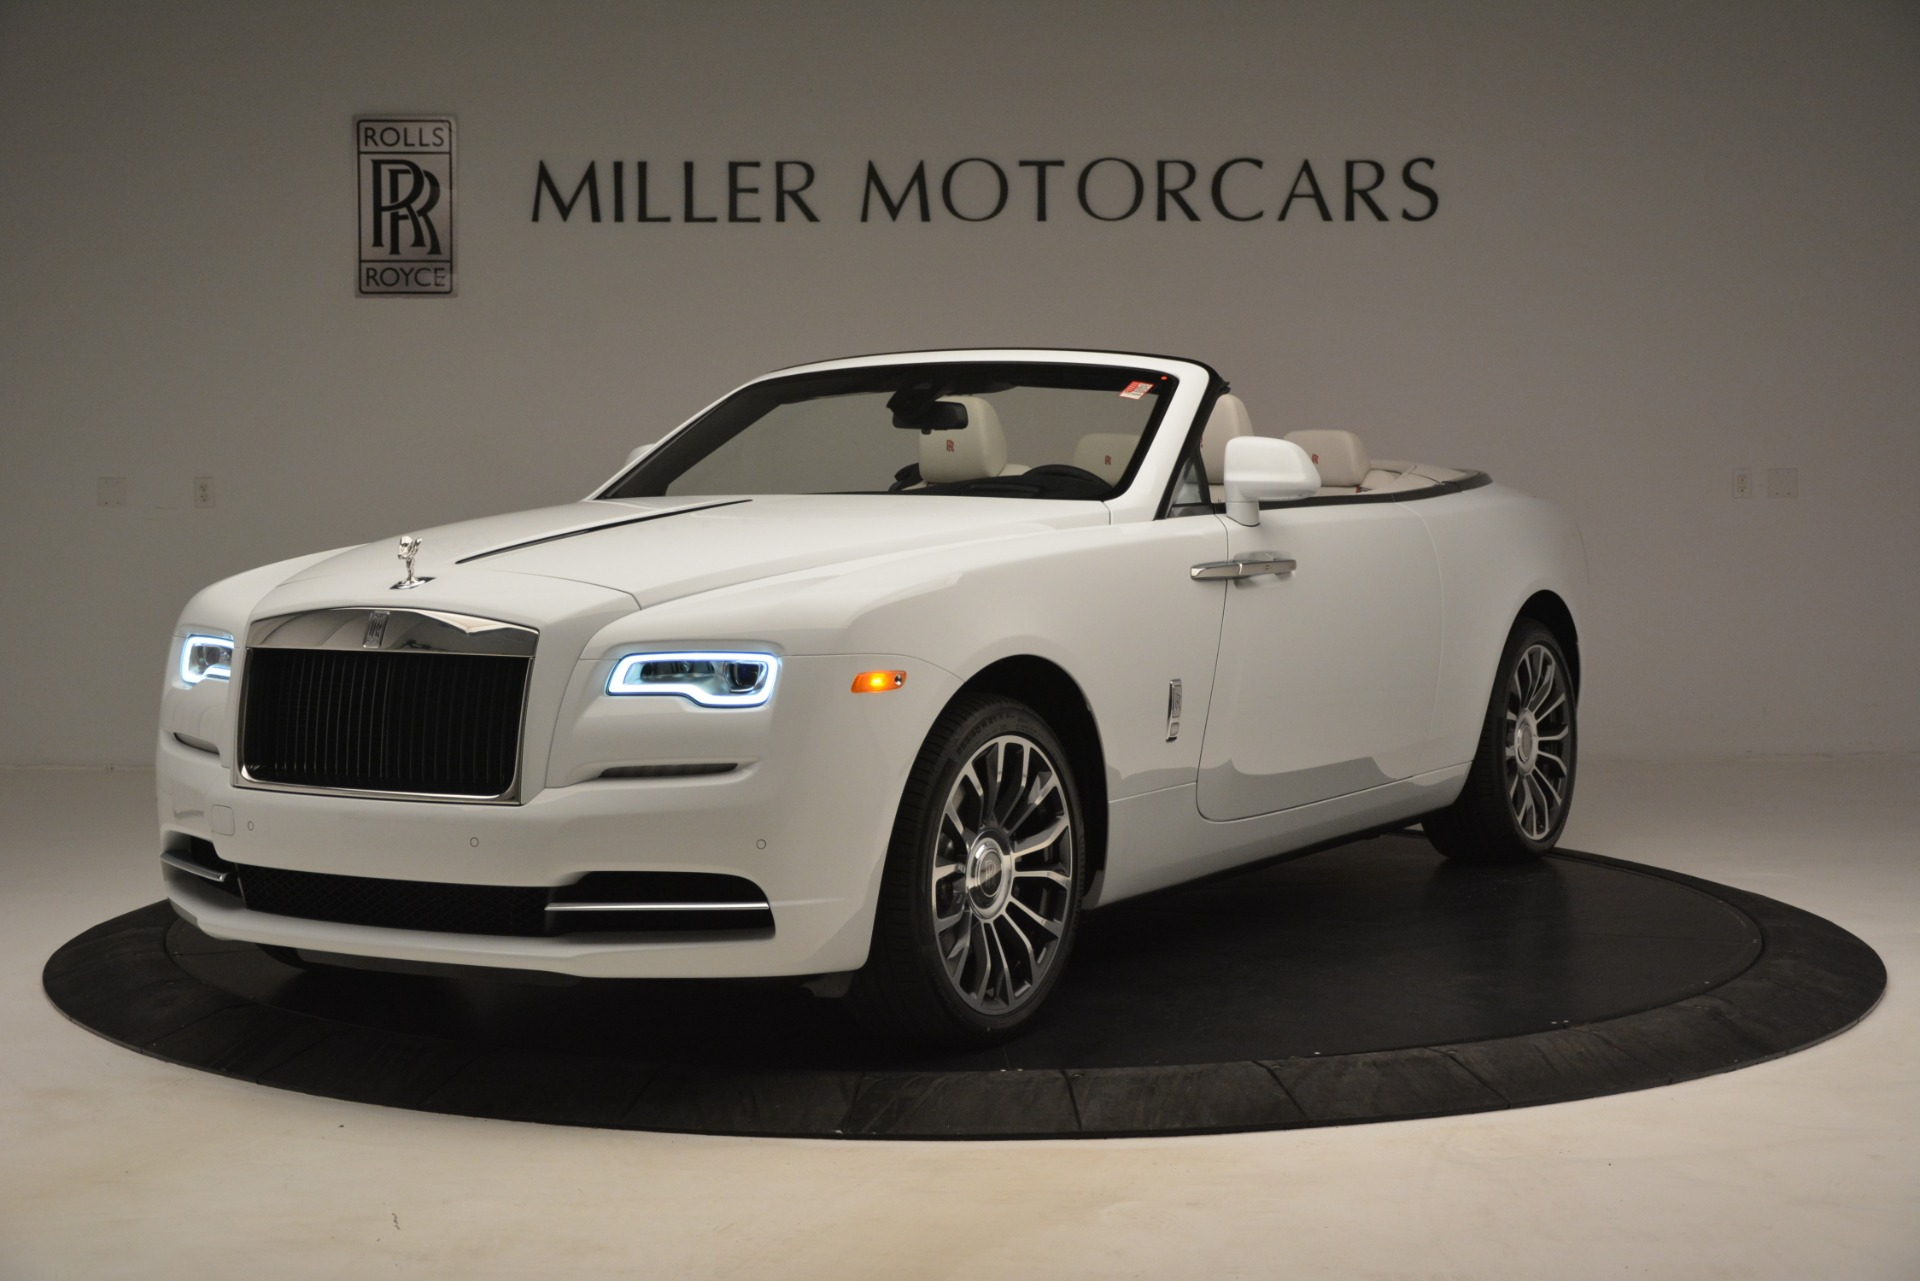 Used 2019 Rolls-Royce Dawn for sale $389,900 at Rolls-Royce Motor Cars Greenwich in Greenwich CT 06830 1